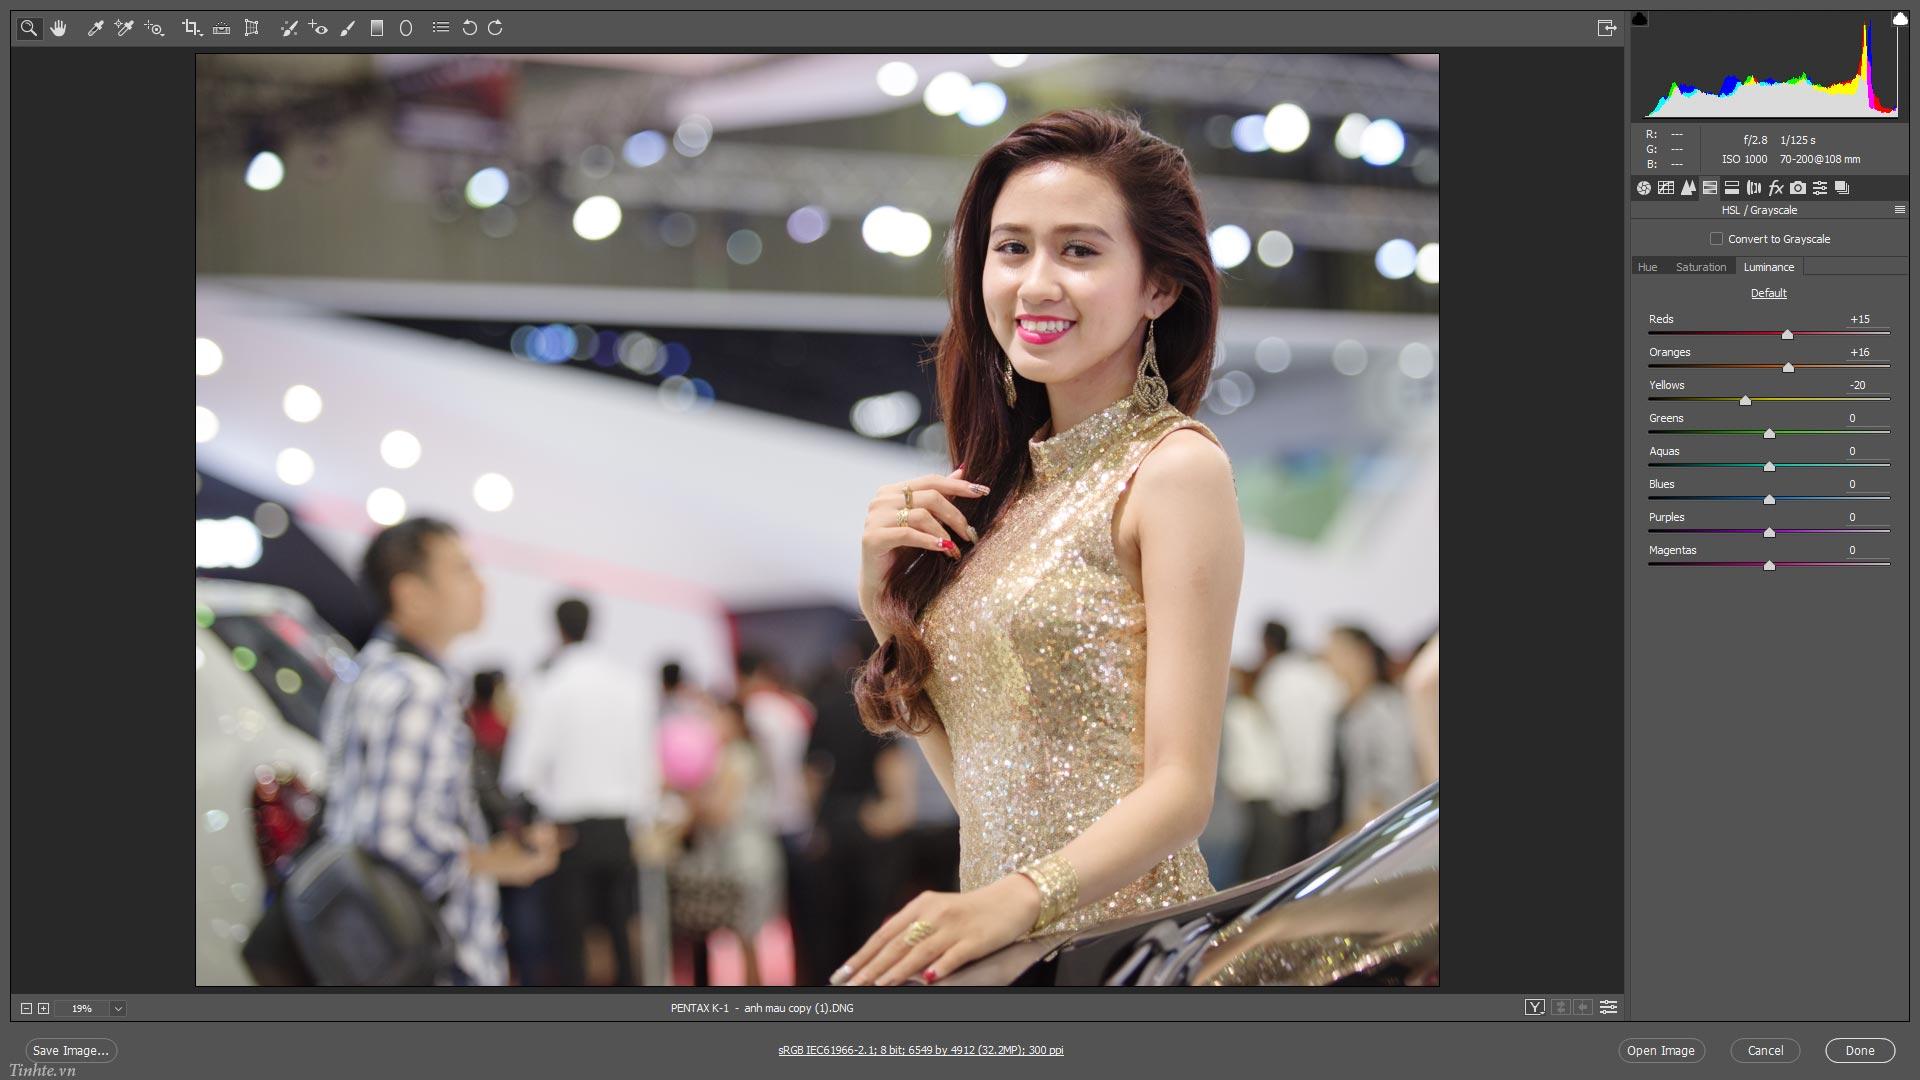 Lam_anh_sang_ro_trong_treo_hon_tinhte.vn_02.jpg